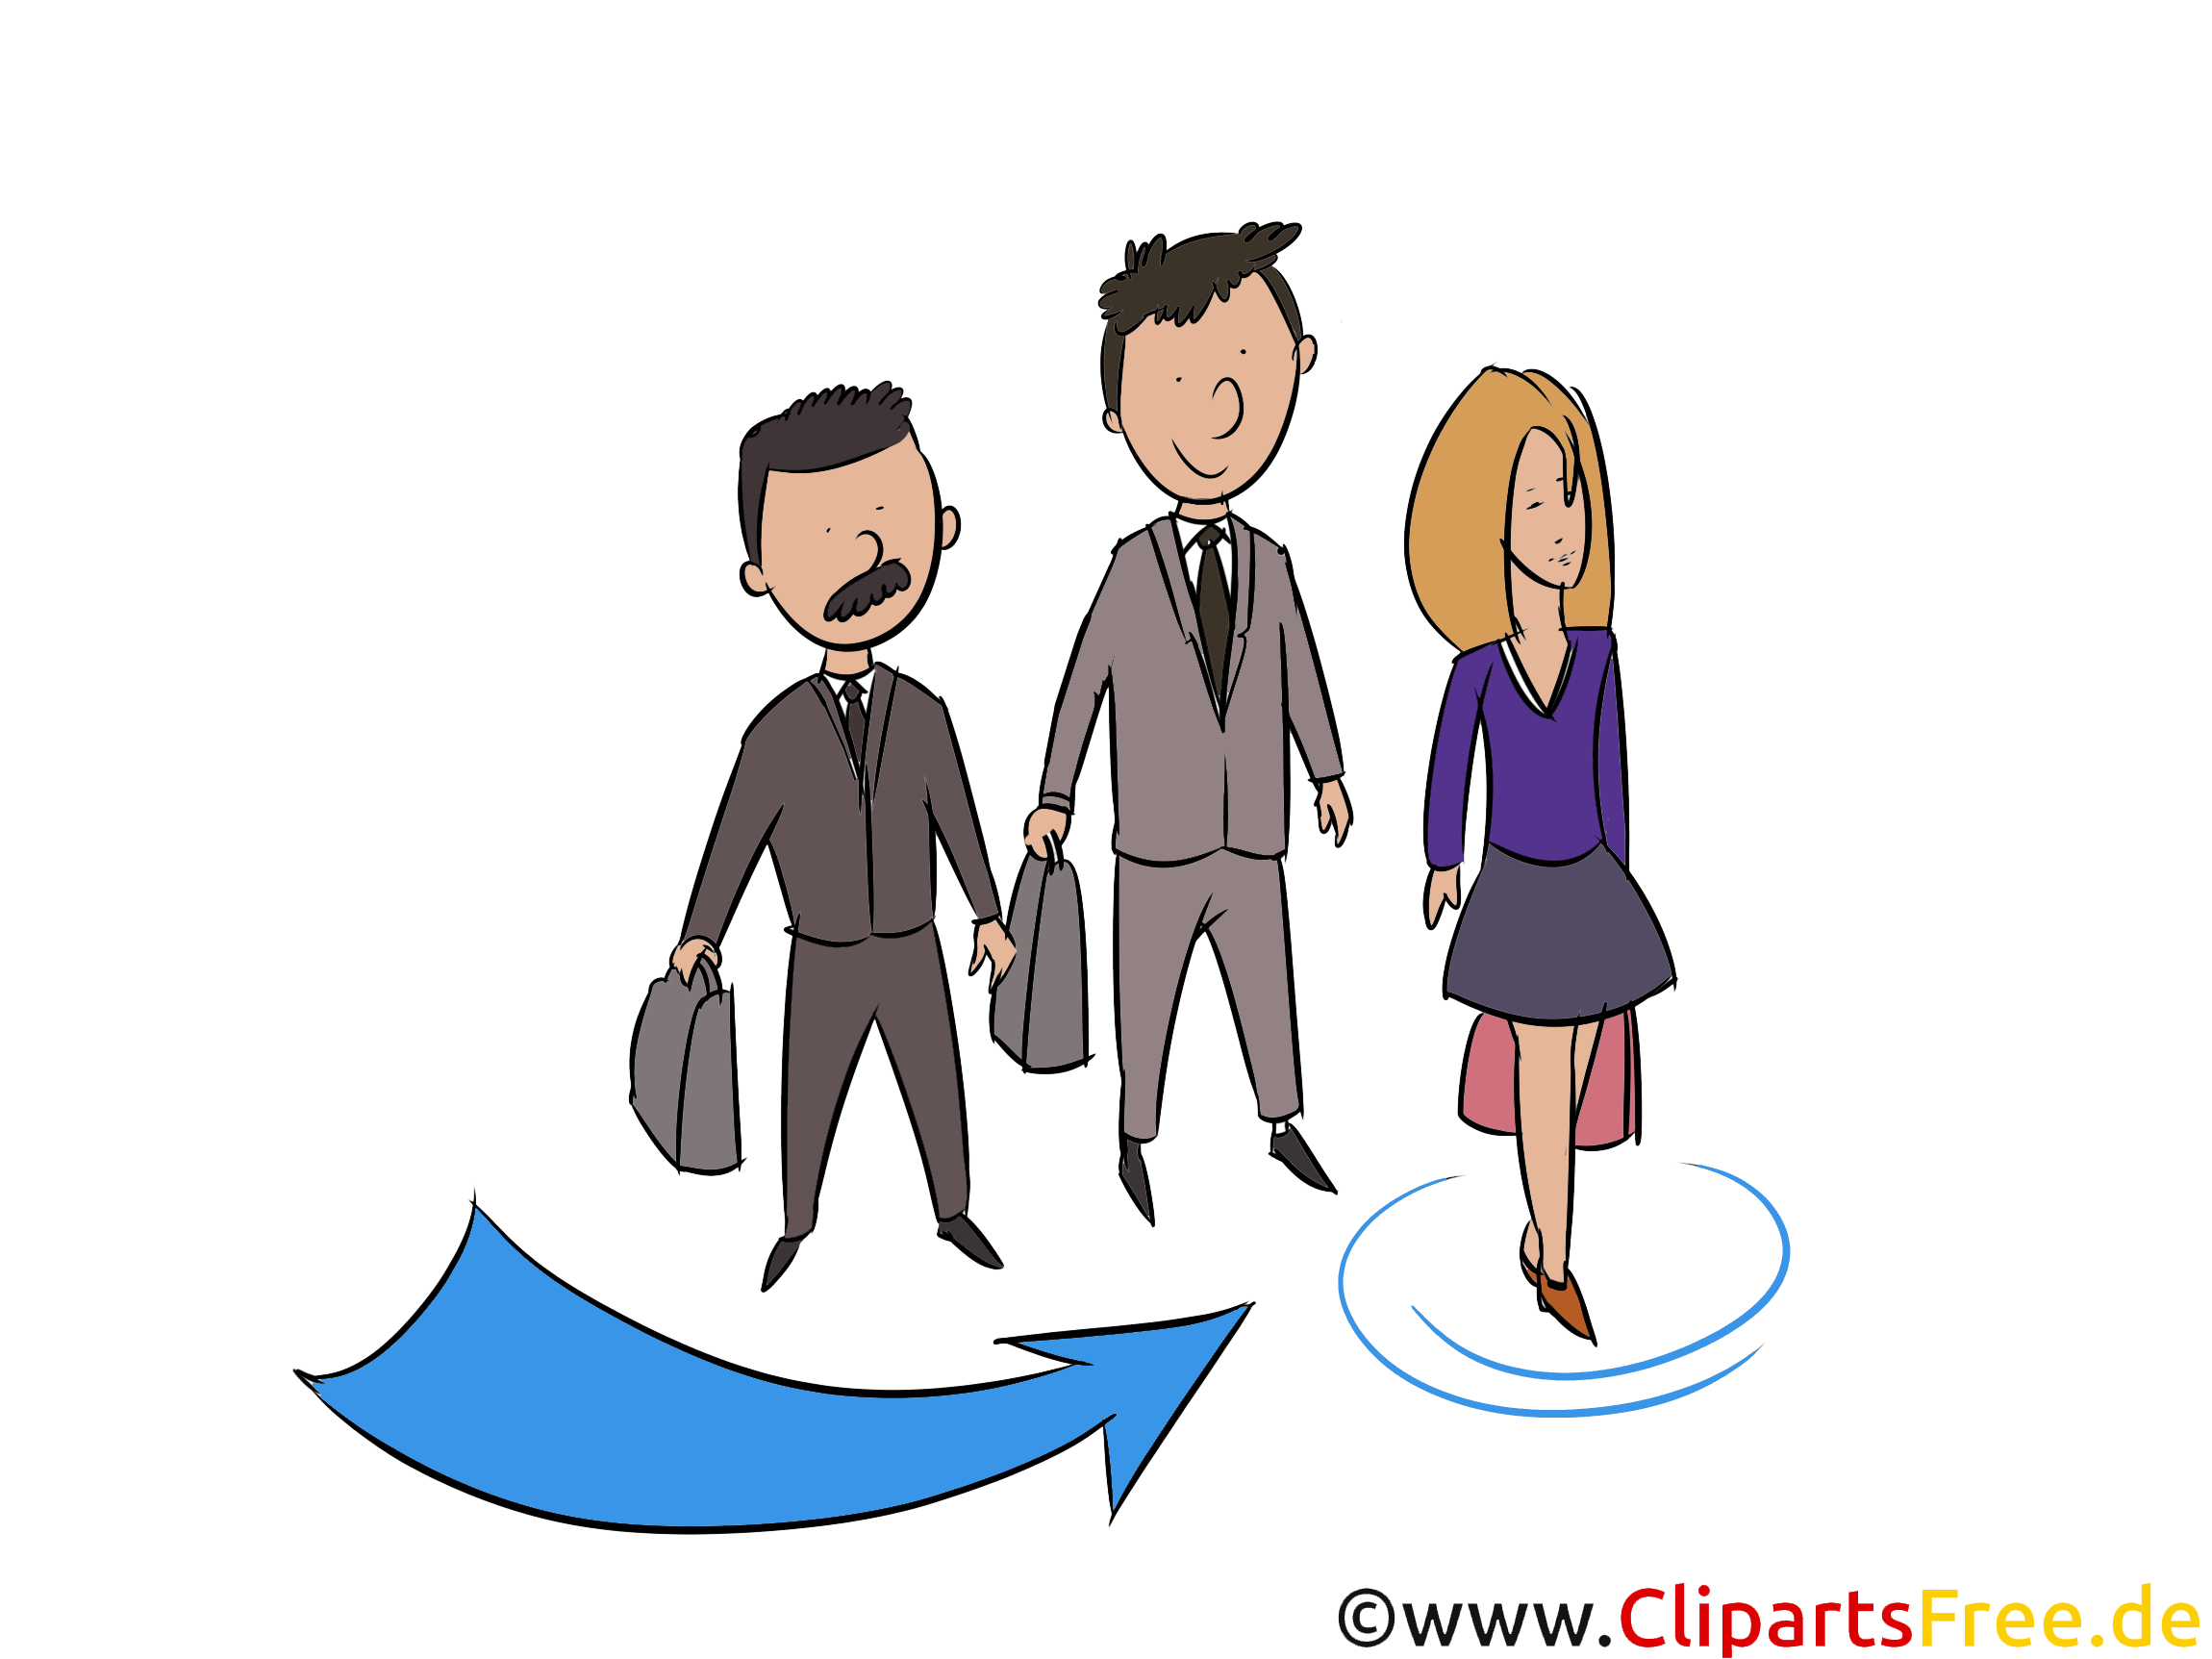 Personal Clip-Art und Illustrationen